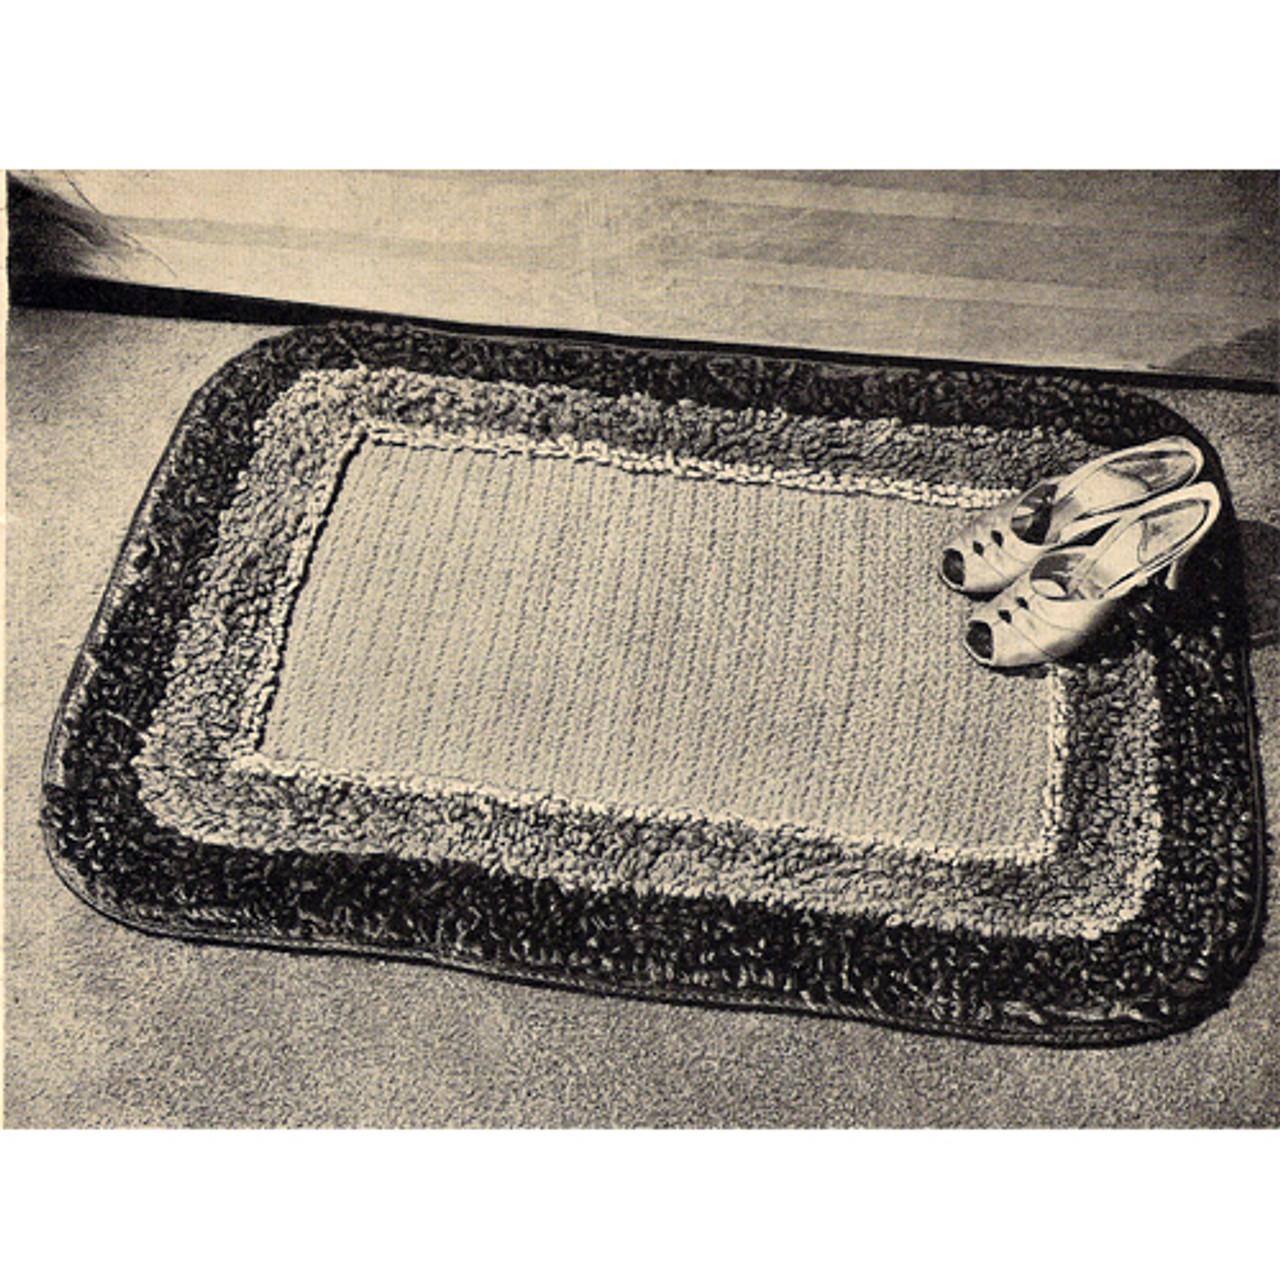 Crochet Rug Pattern with Loop Stitch Border